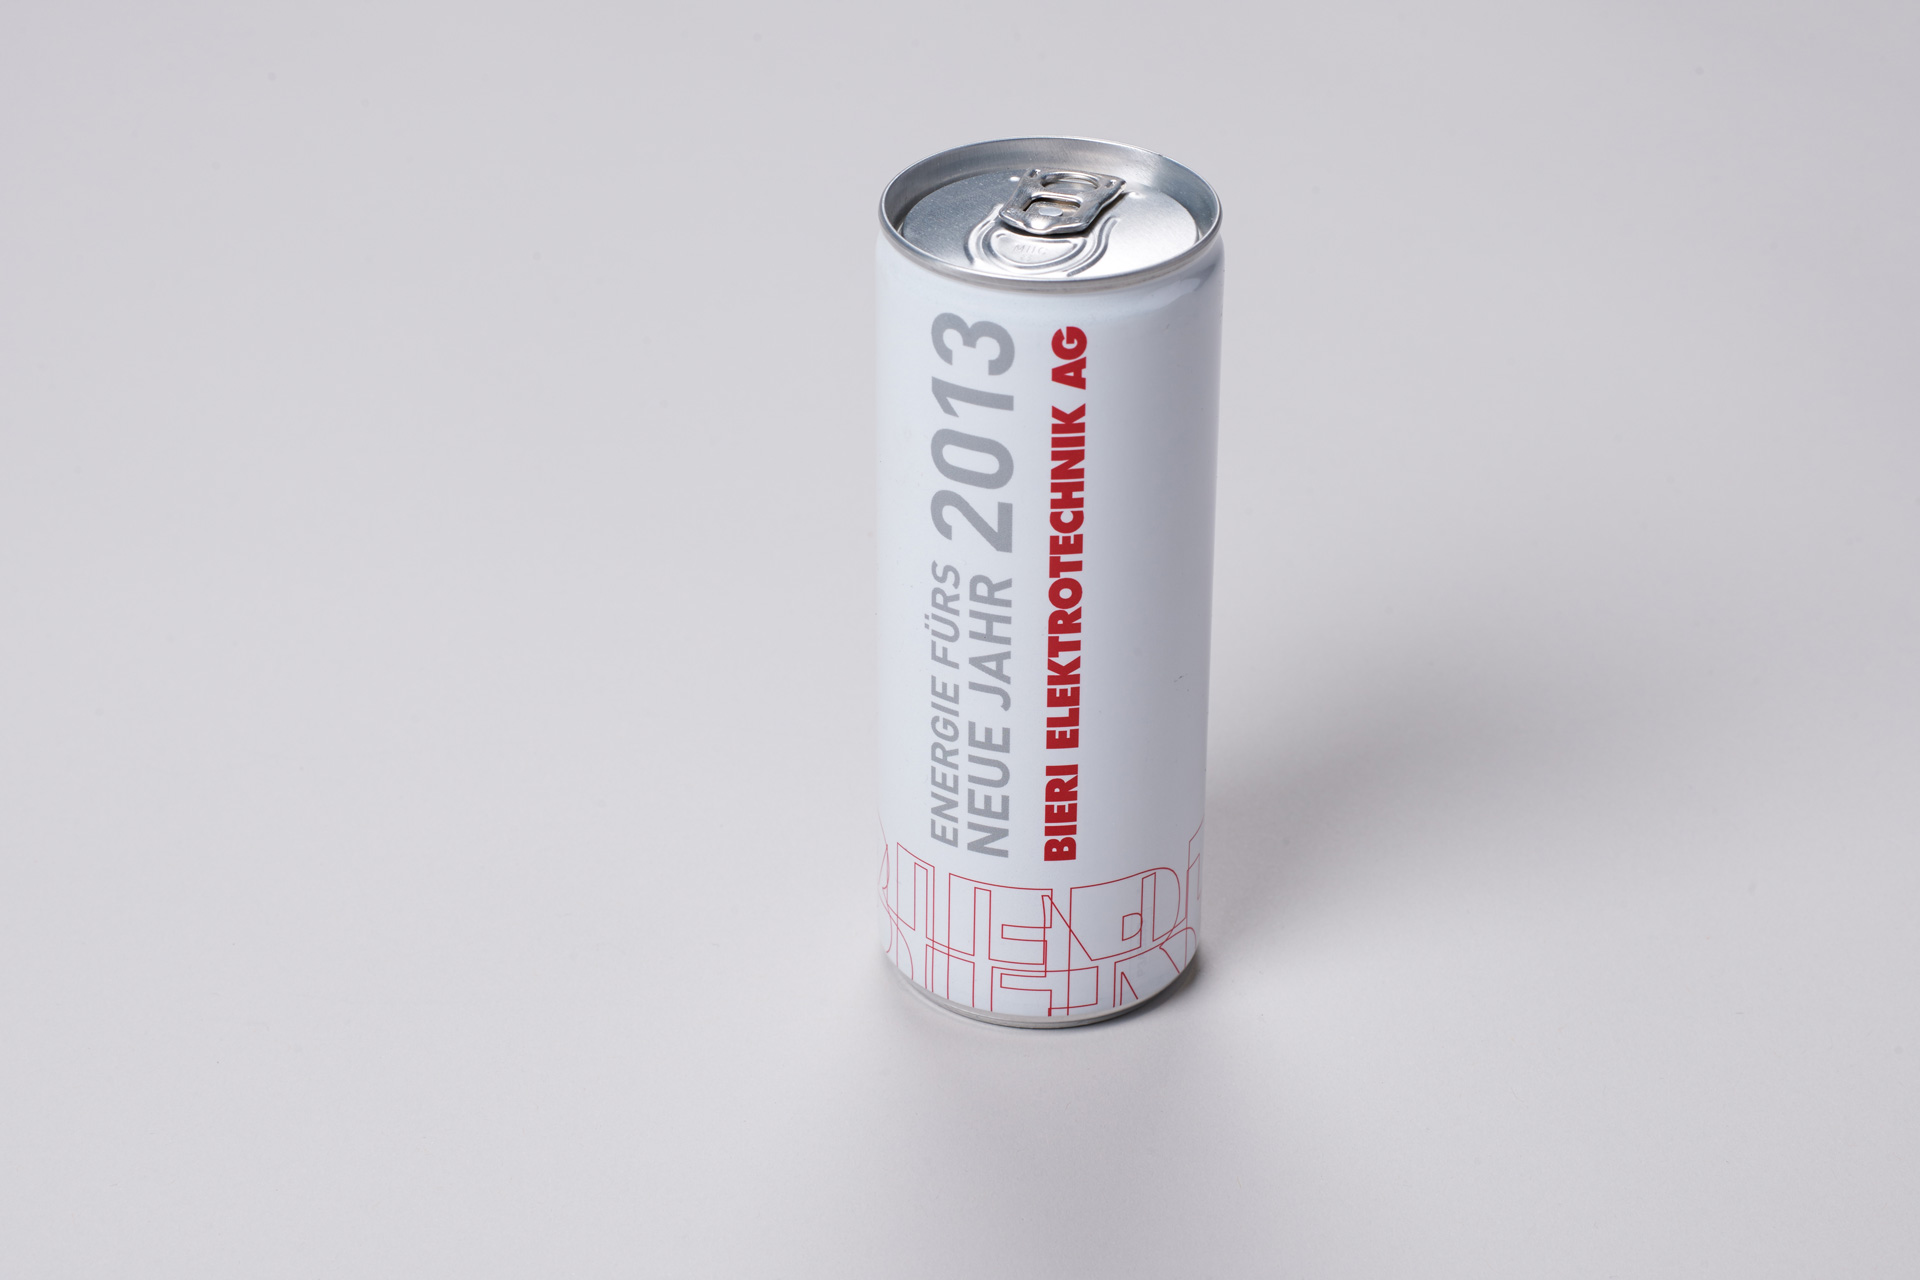 toloom-arbeiten-bieri-elektrotechnik-2-energydrink.jpg